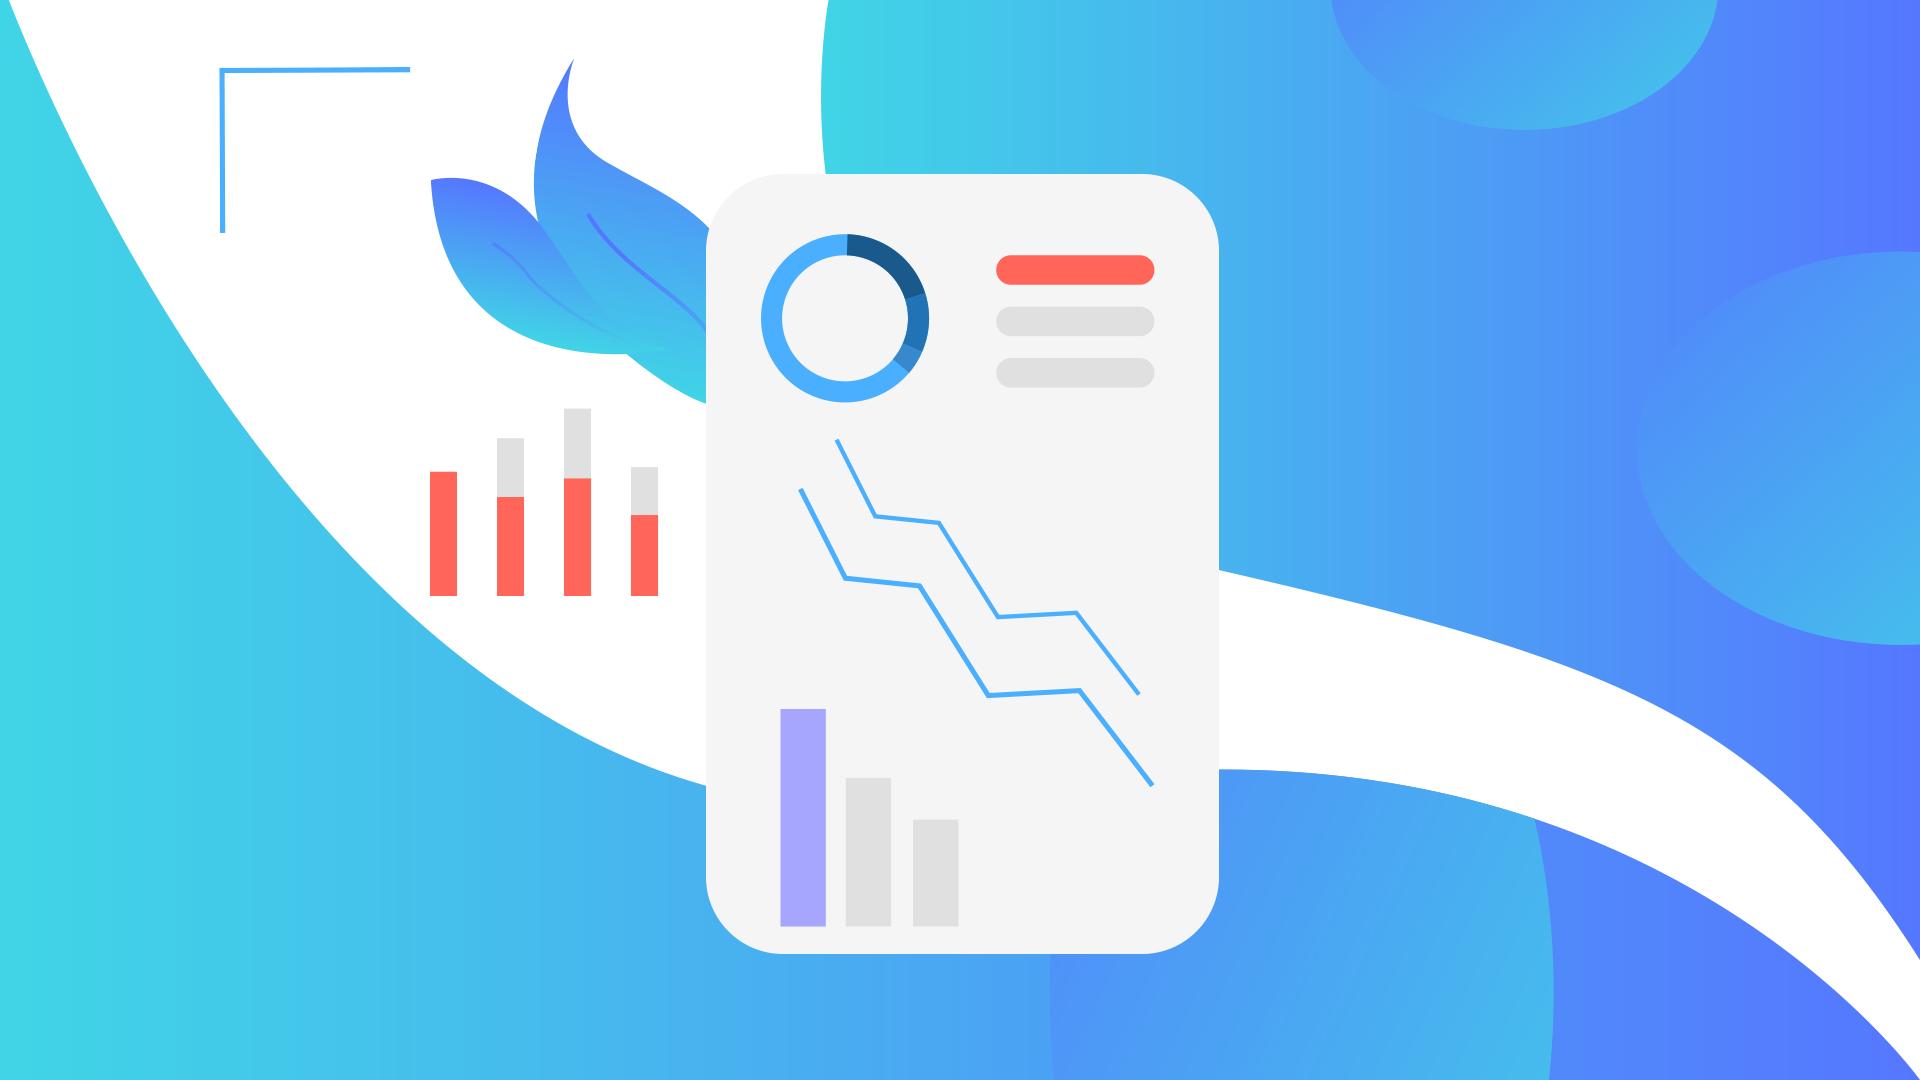 Mobile app analytics tools ensure key metrics data analysis and organization—general info gathering, info on marketing/promotion, monetization data, etc.